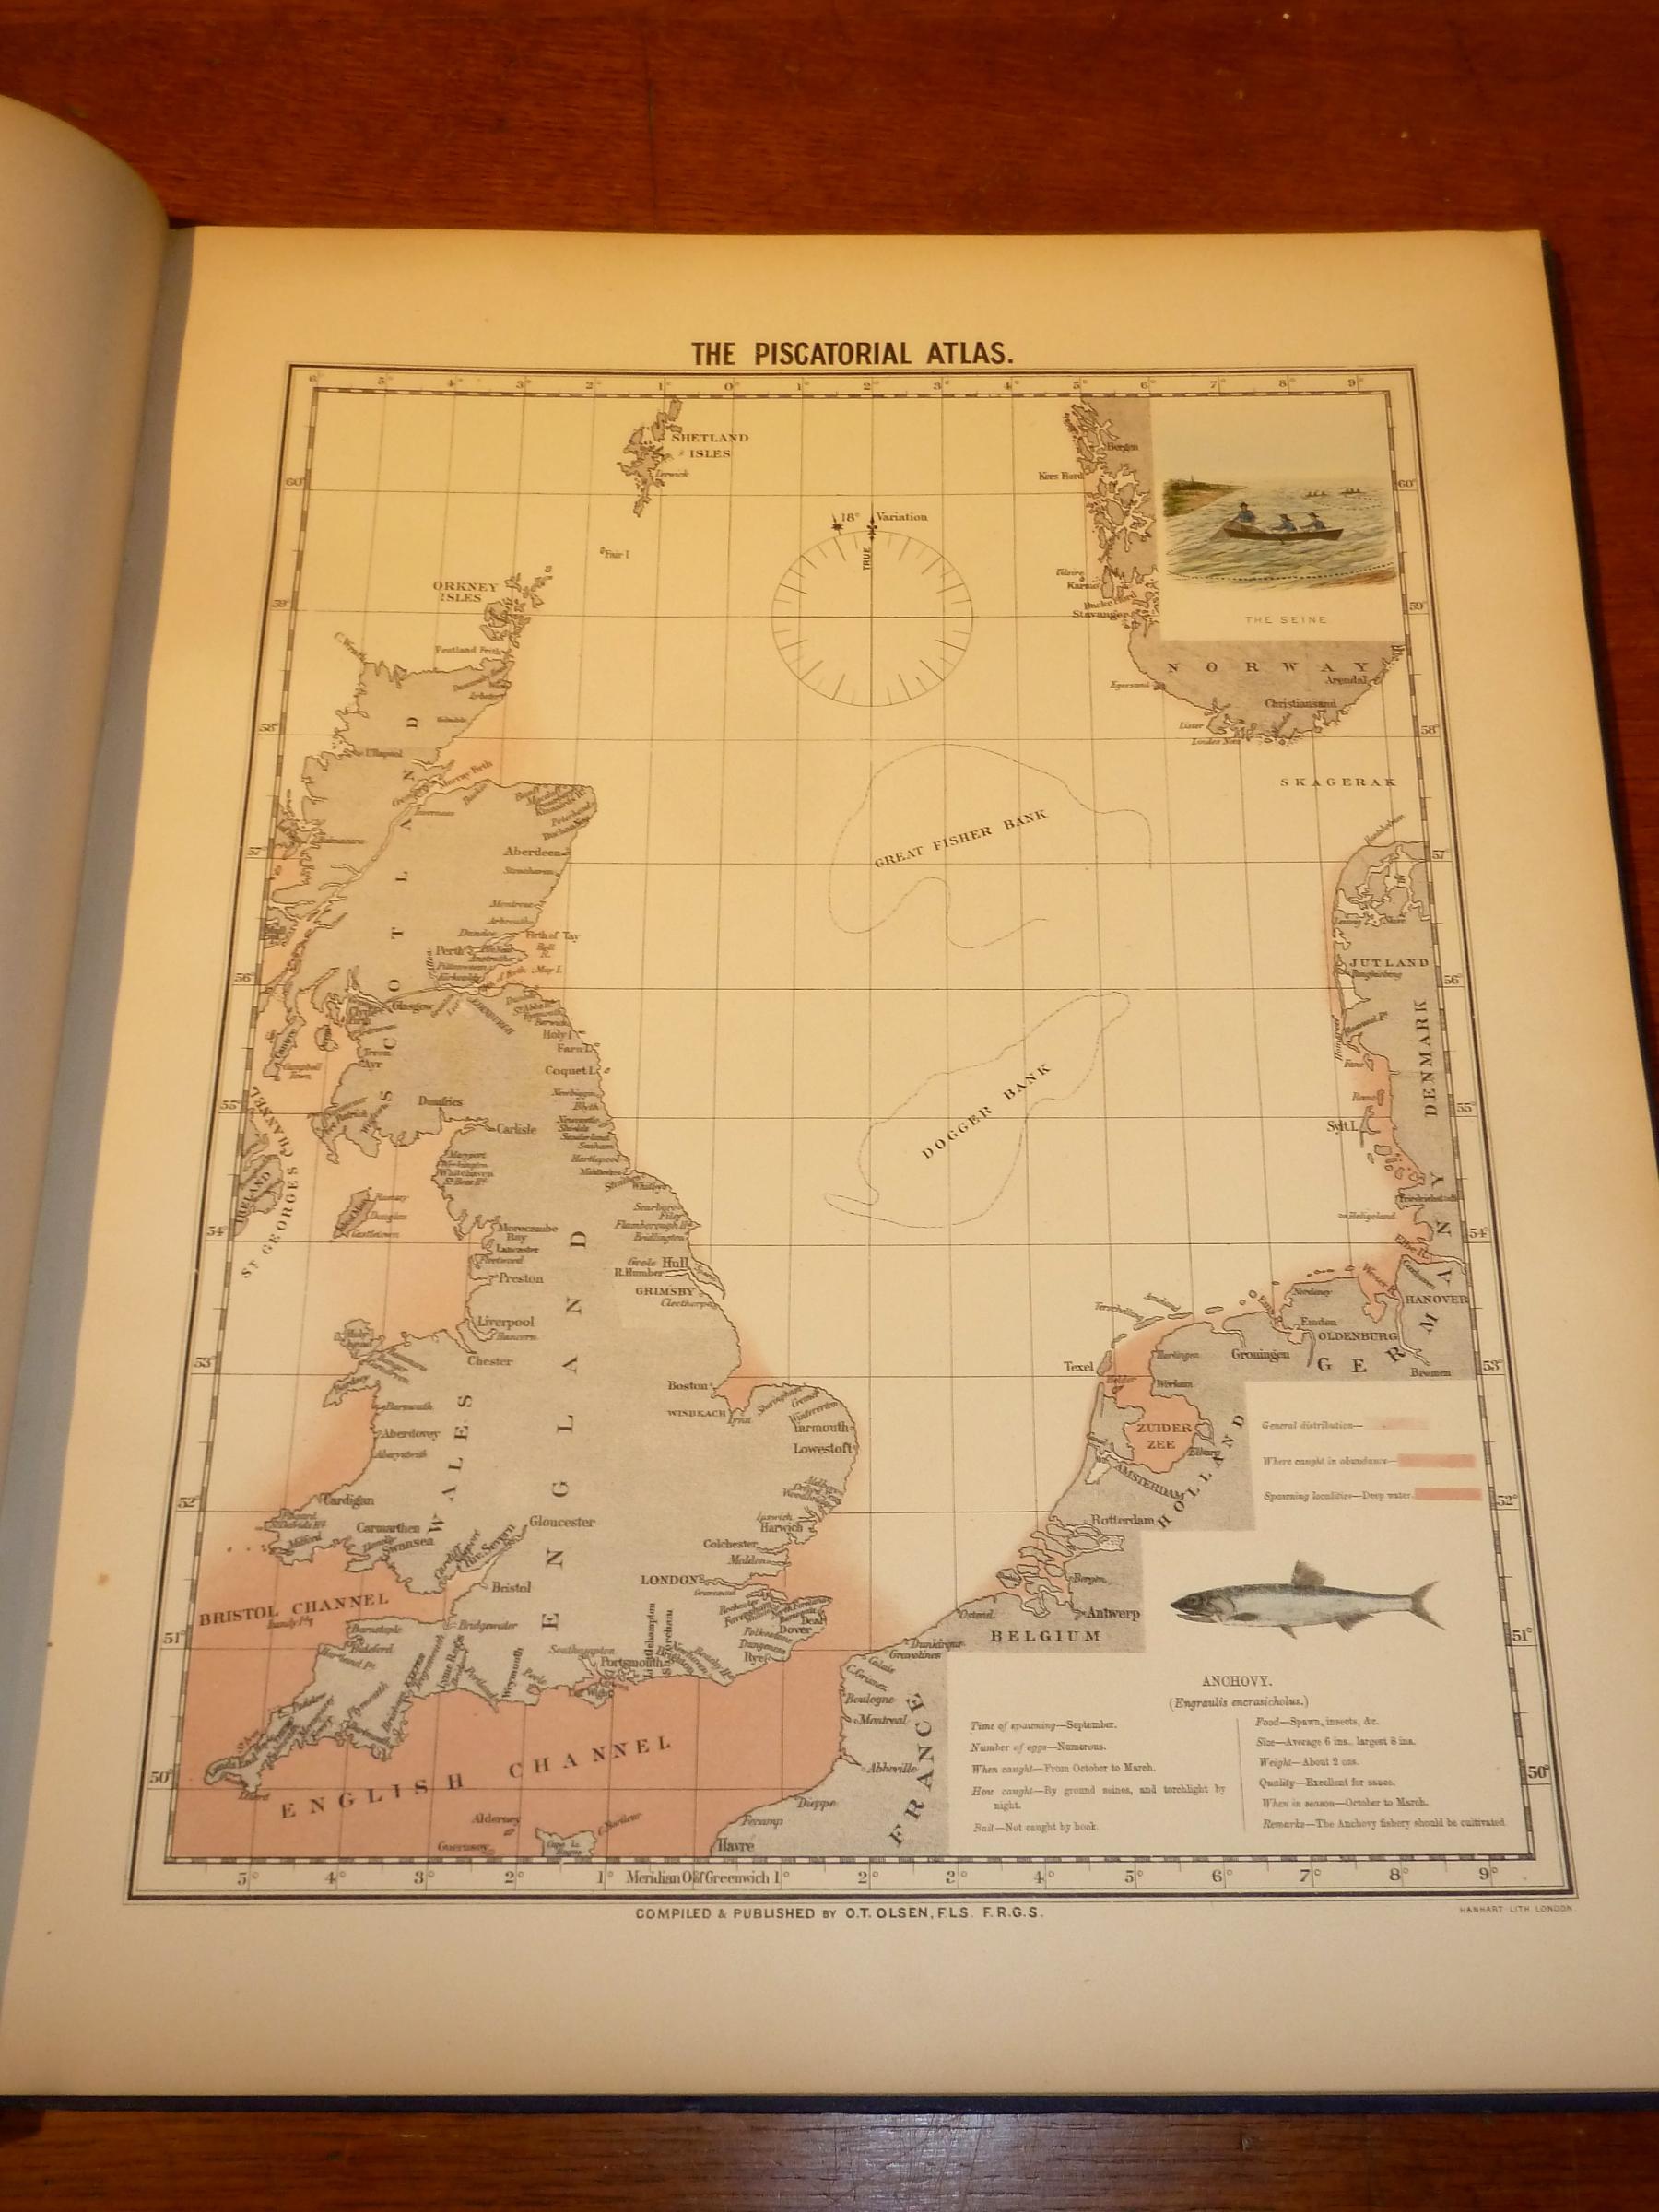 The Piscatorial Atlas